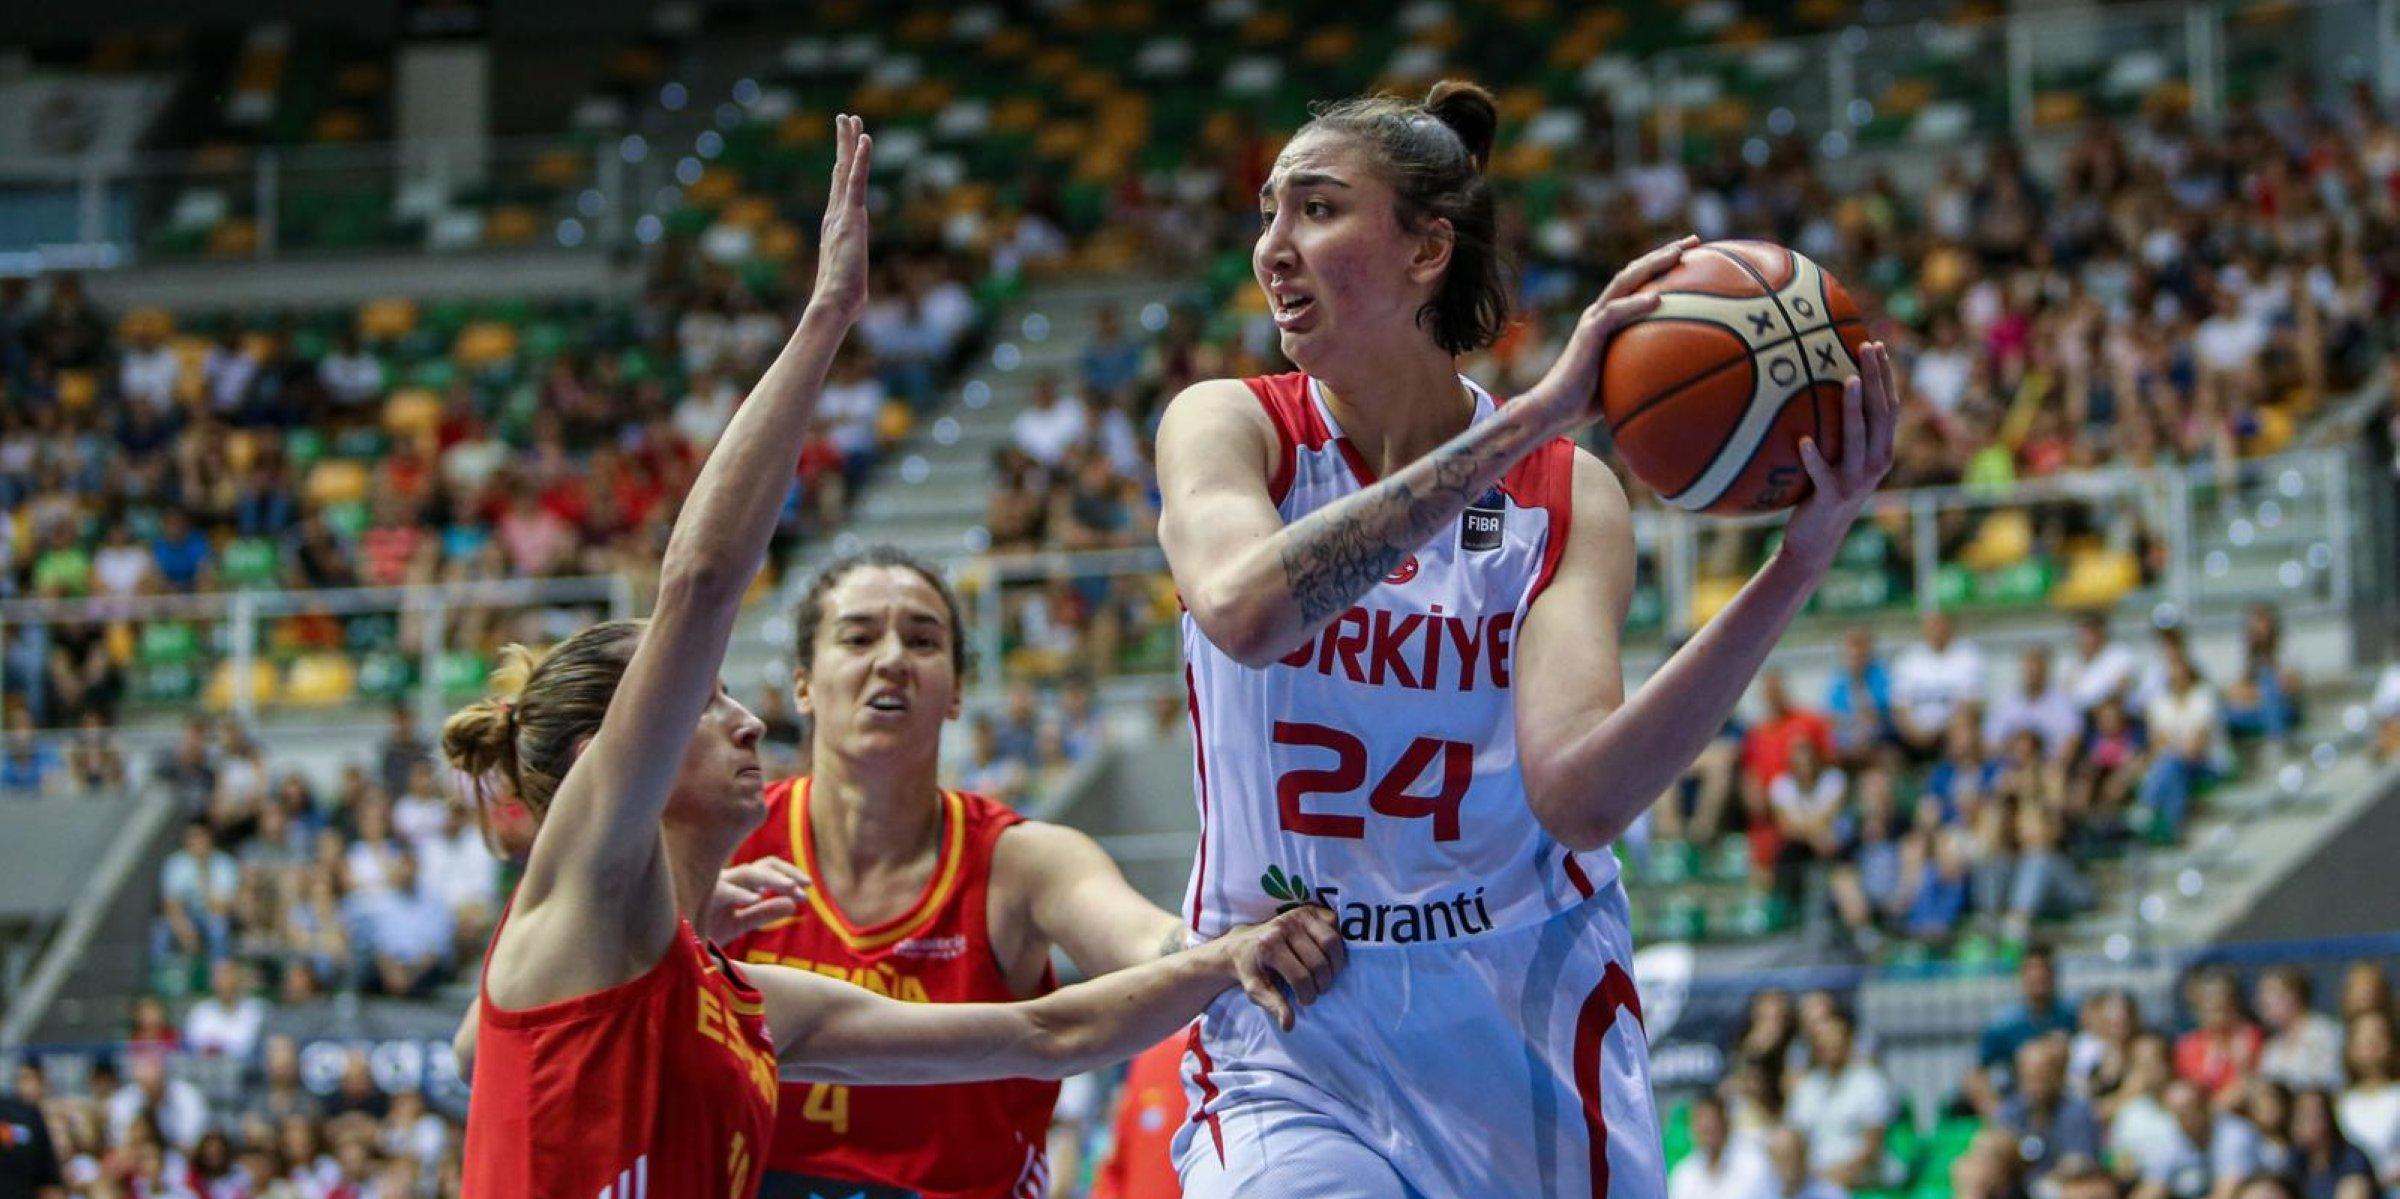 Transfer To Barcelona A Milestone For My Career Turkish Basketball Player Says Daily Sabah